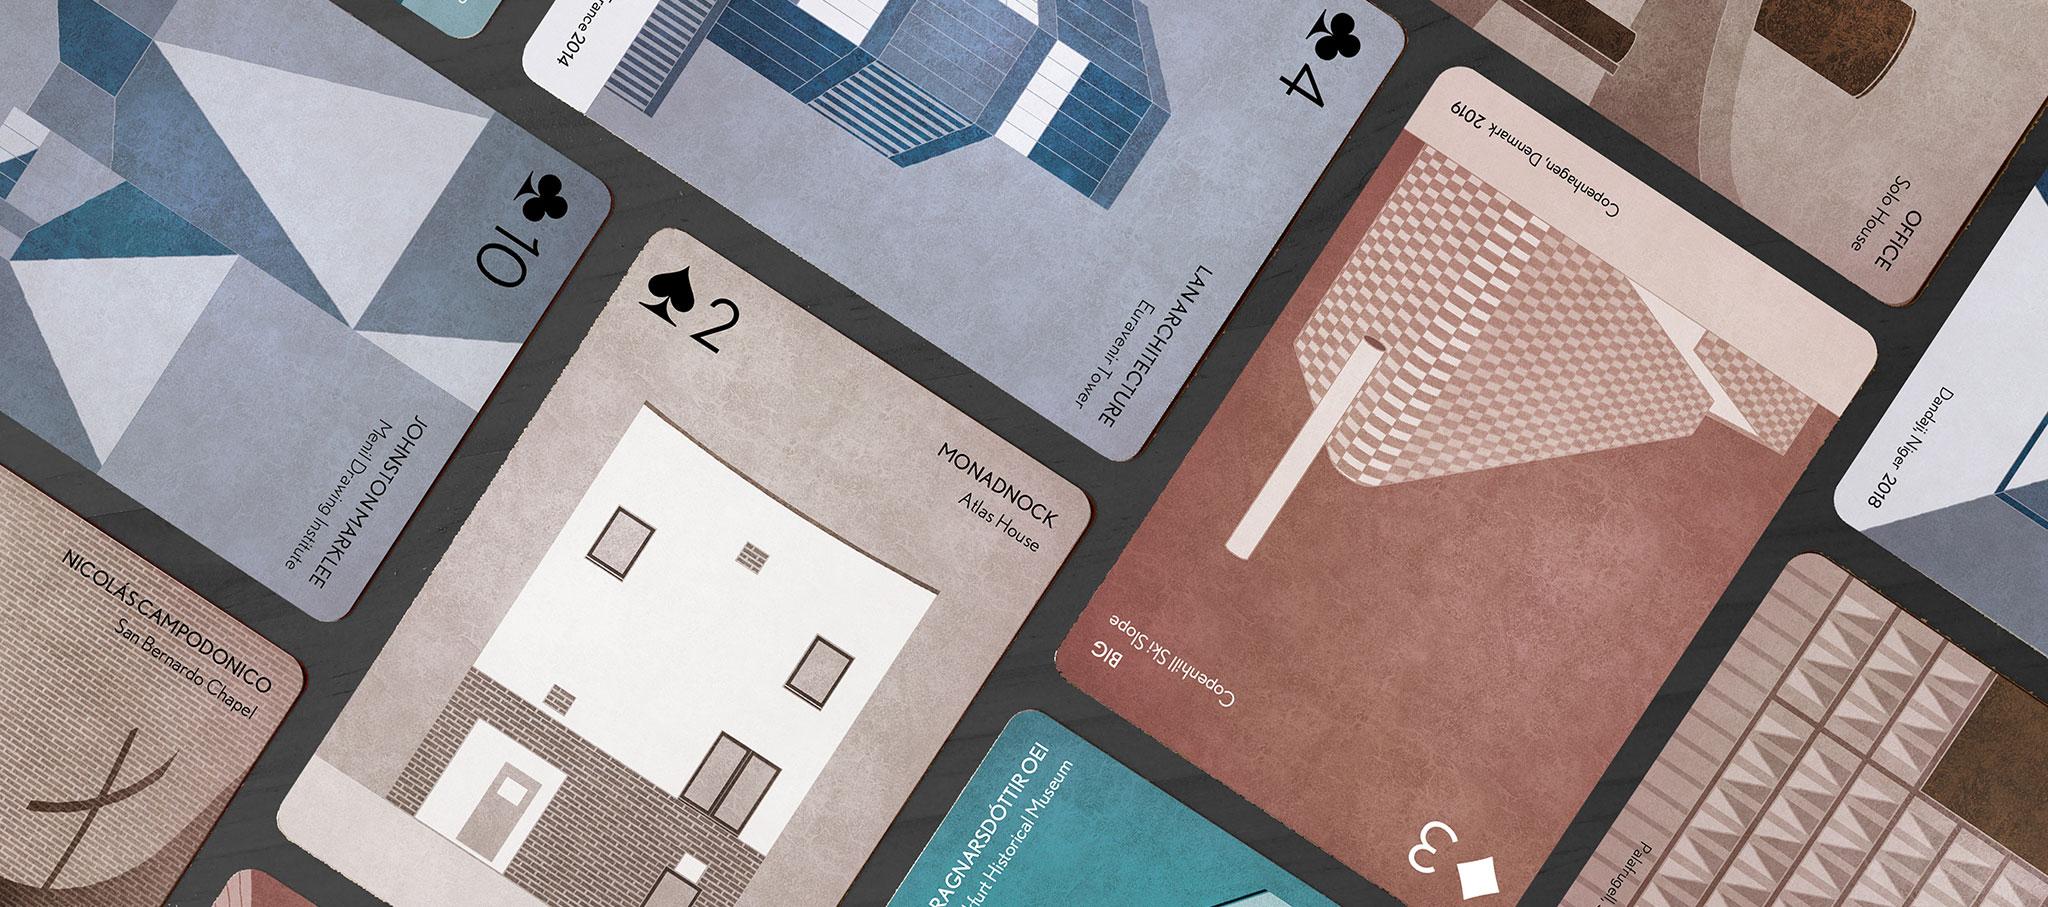 SCALA · Architecture Playing Cards por Arquitectura a contrapelo